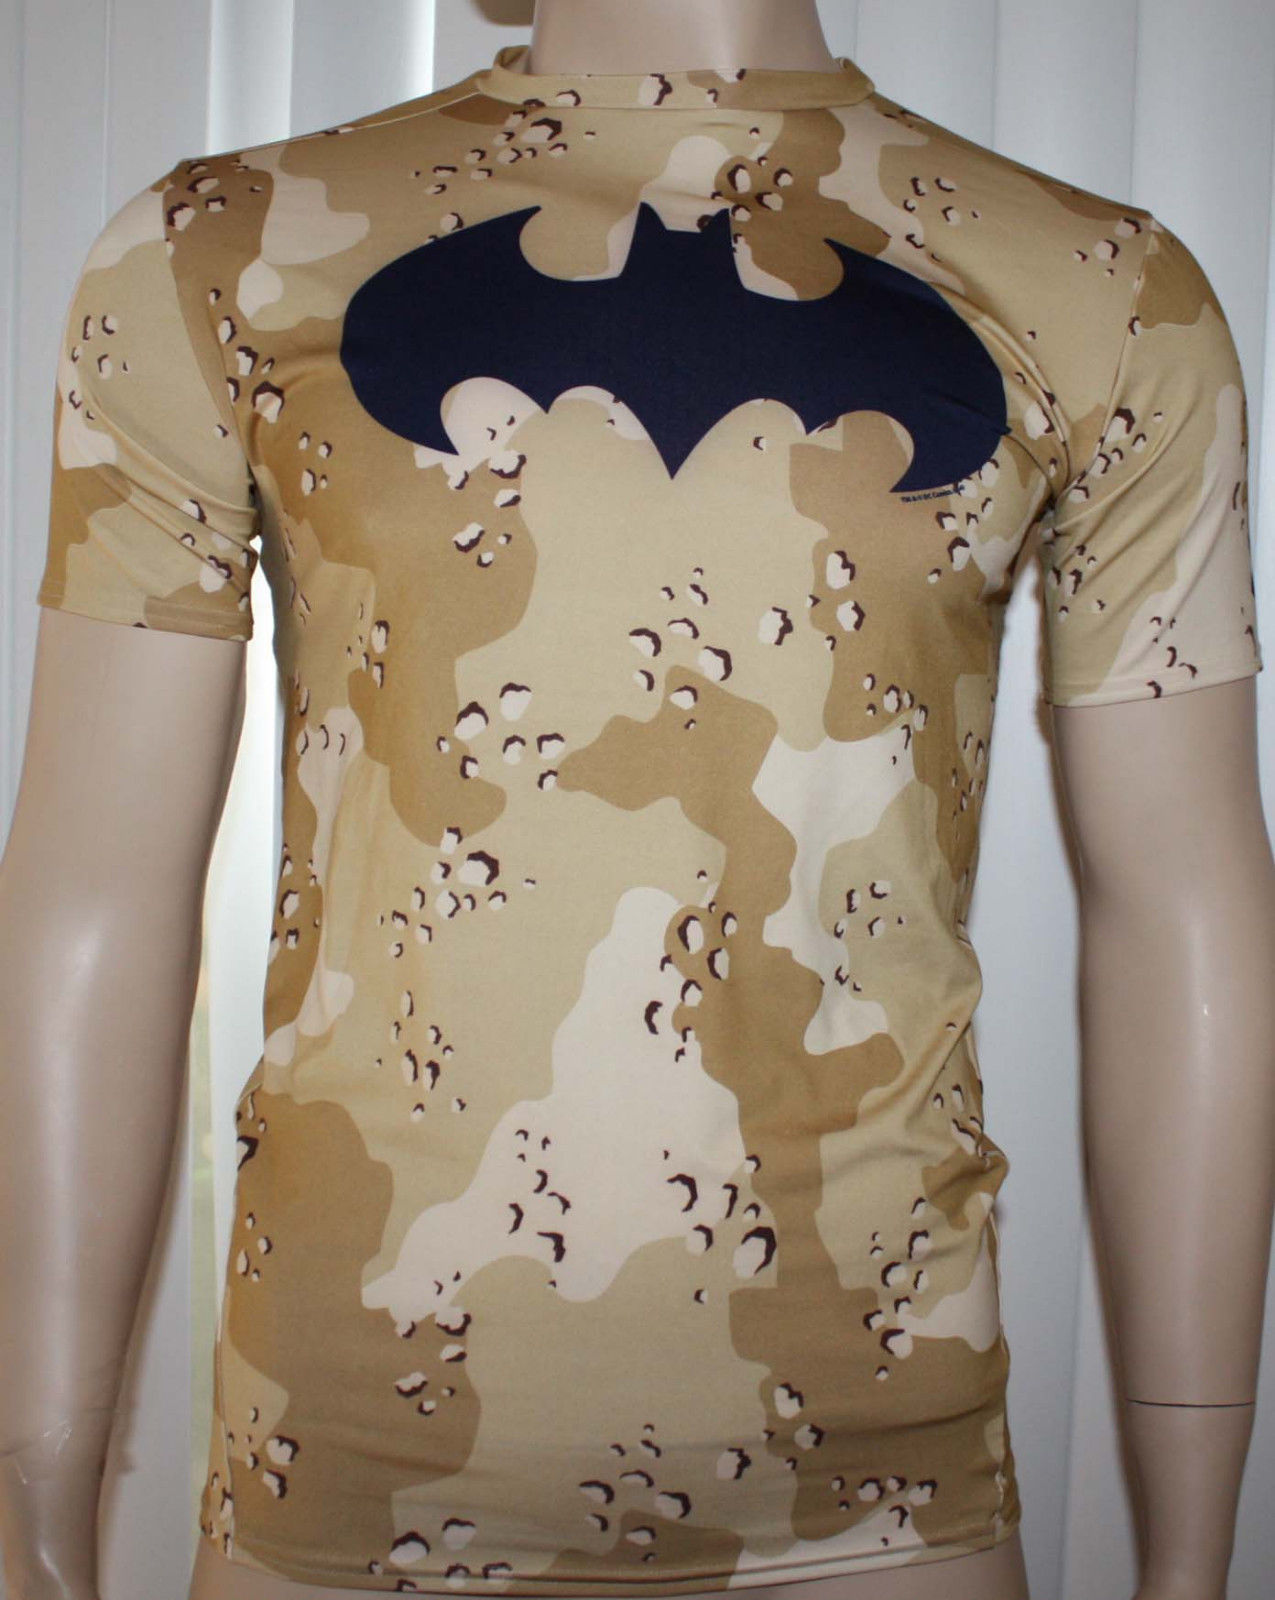 Under Armour ALTER EGO Men's Camo/Navy UA Batman Compression Shirt - X-Large 10742